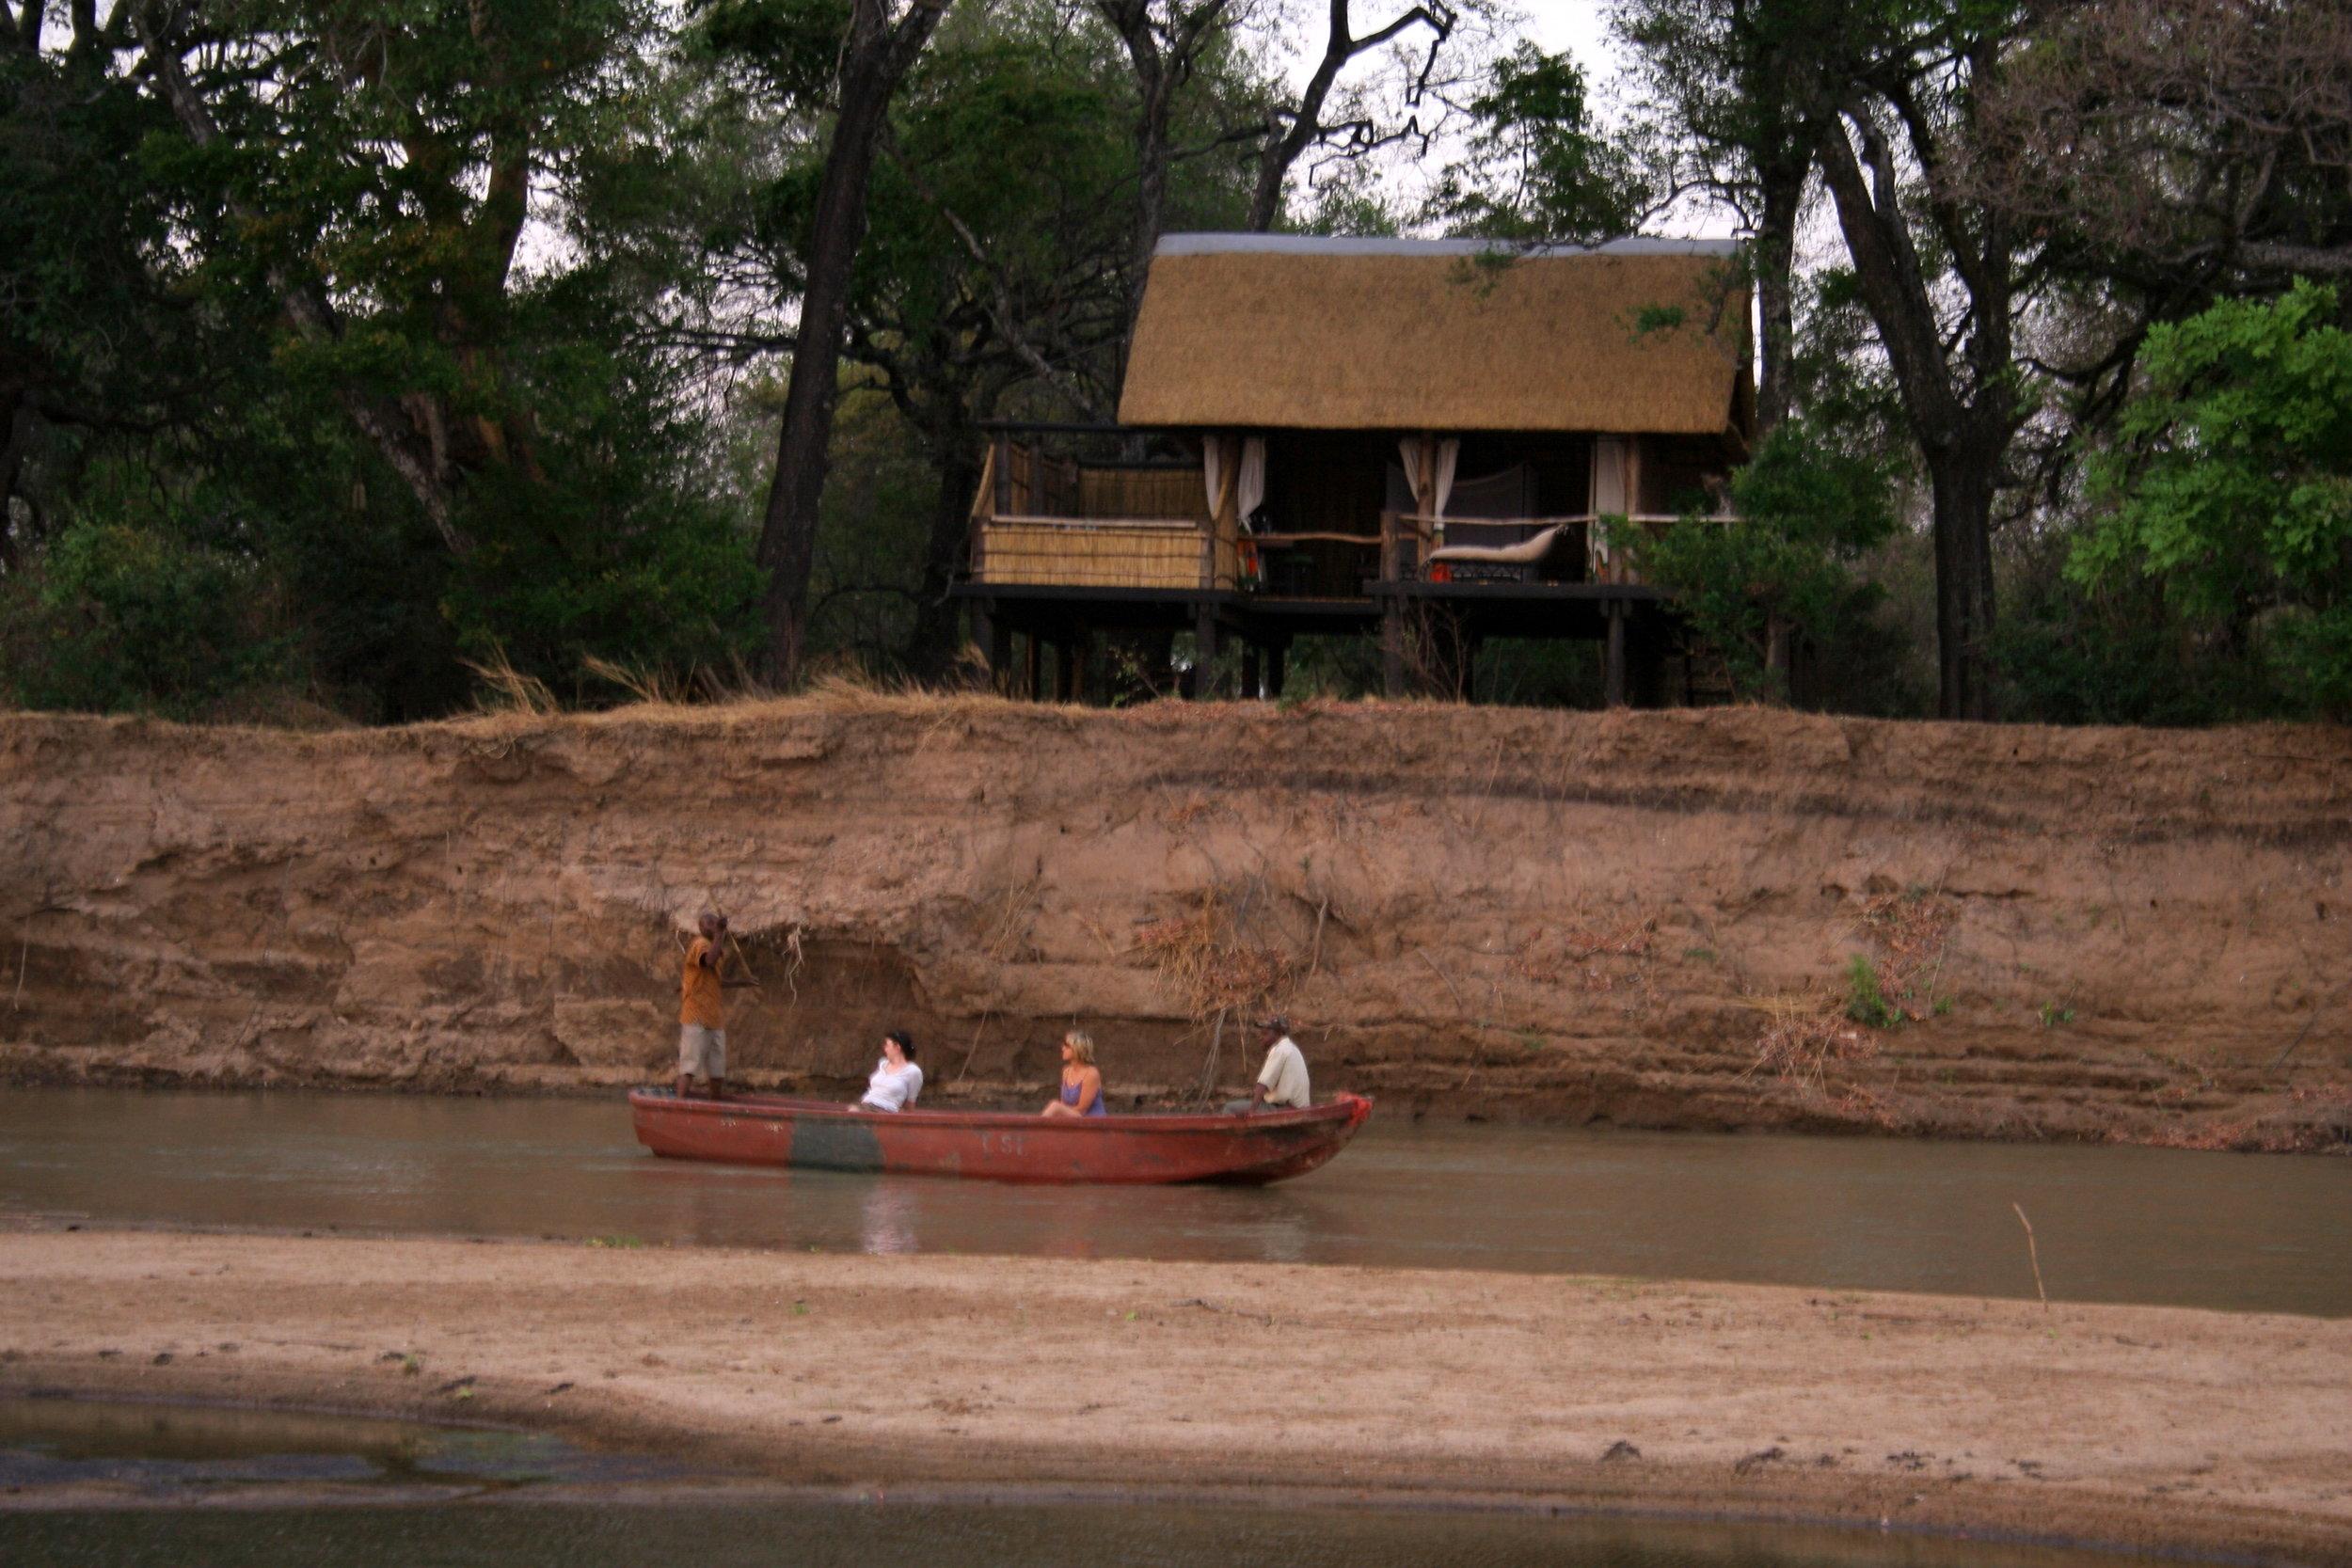 Chindeni Bushcamp on the Luangwa River.